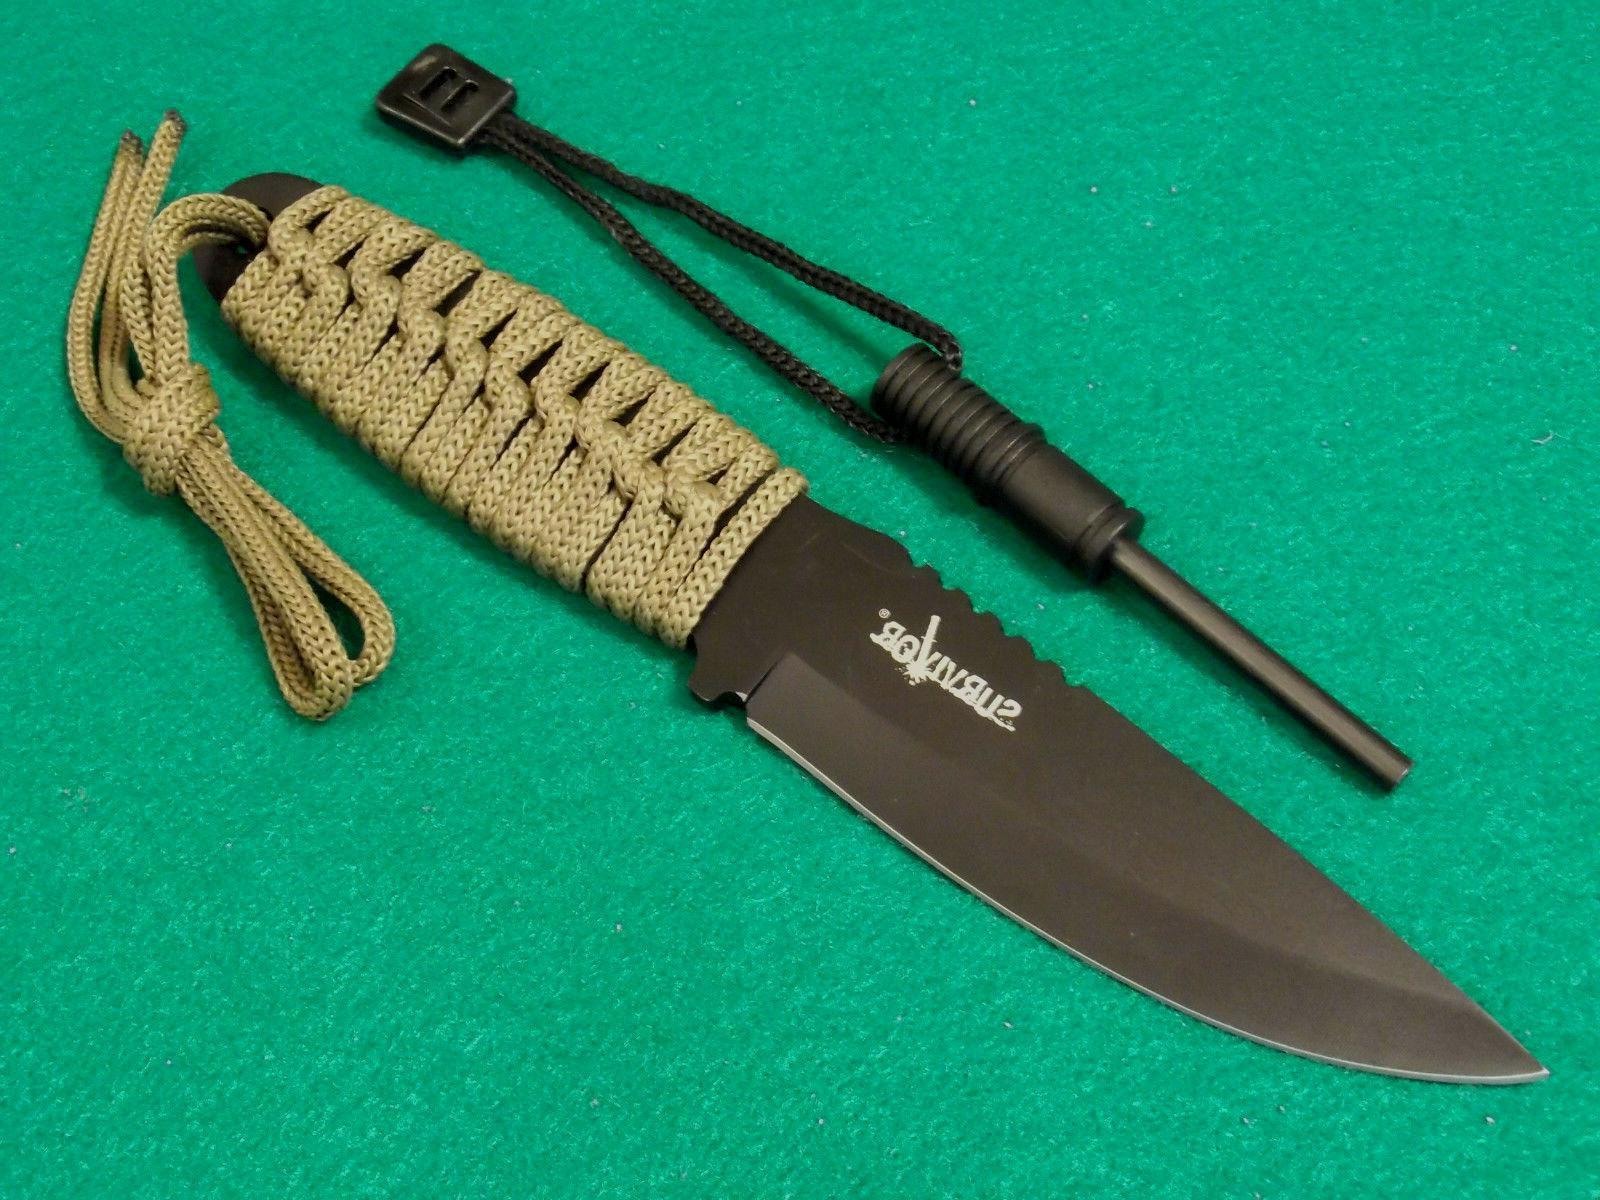 hk 106t fixed knife